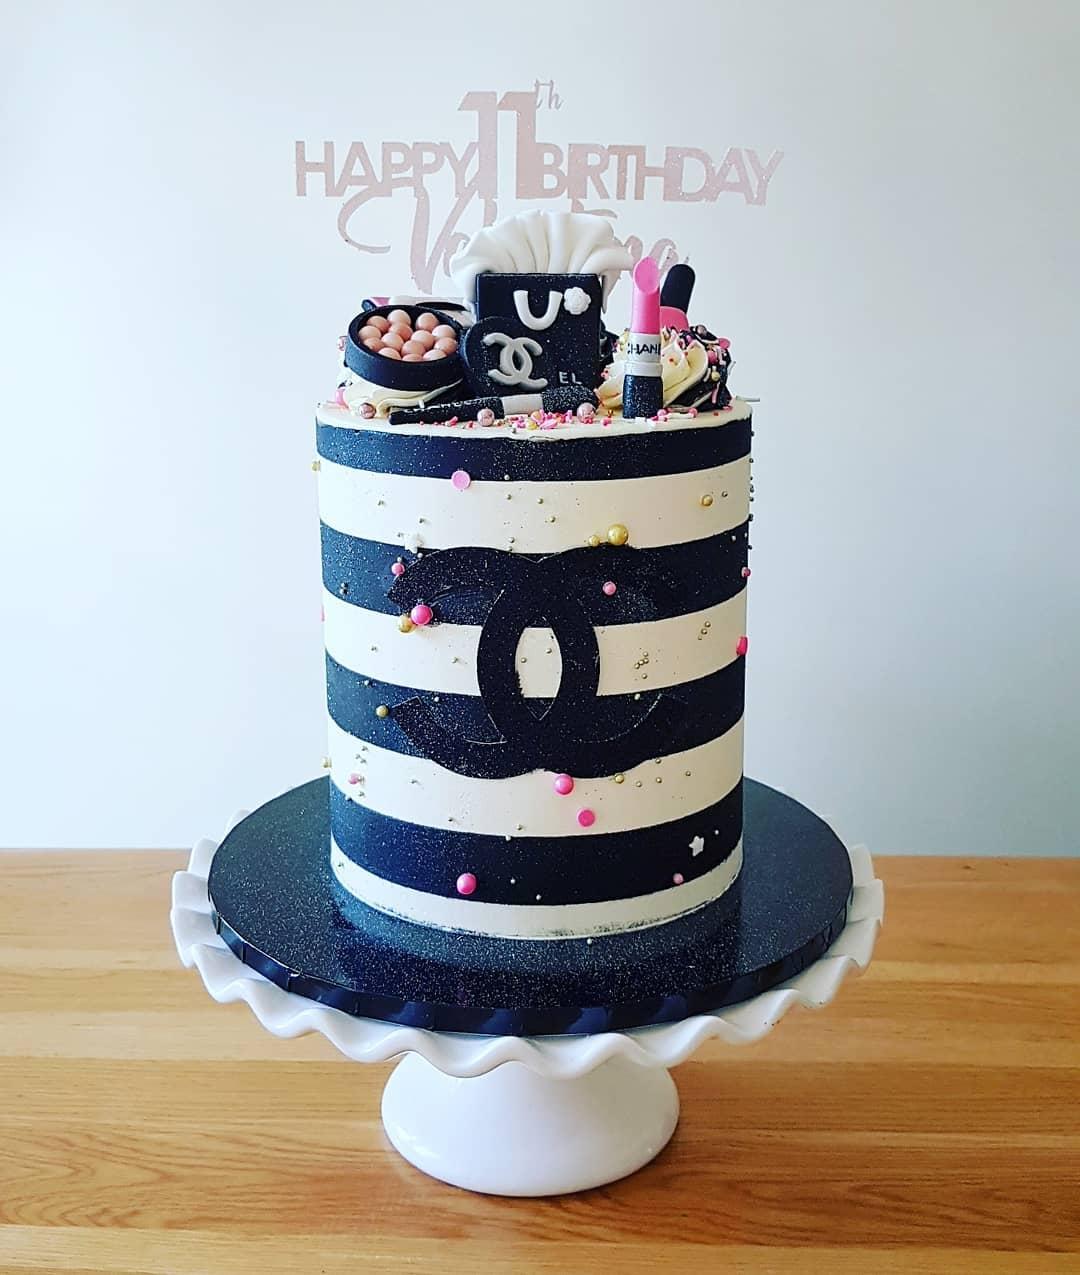 Chanel Make-up cake